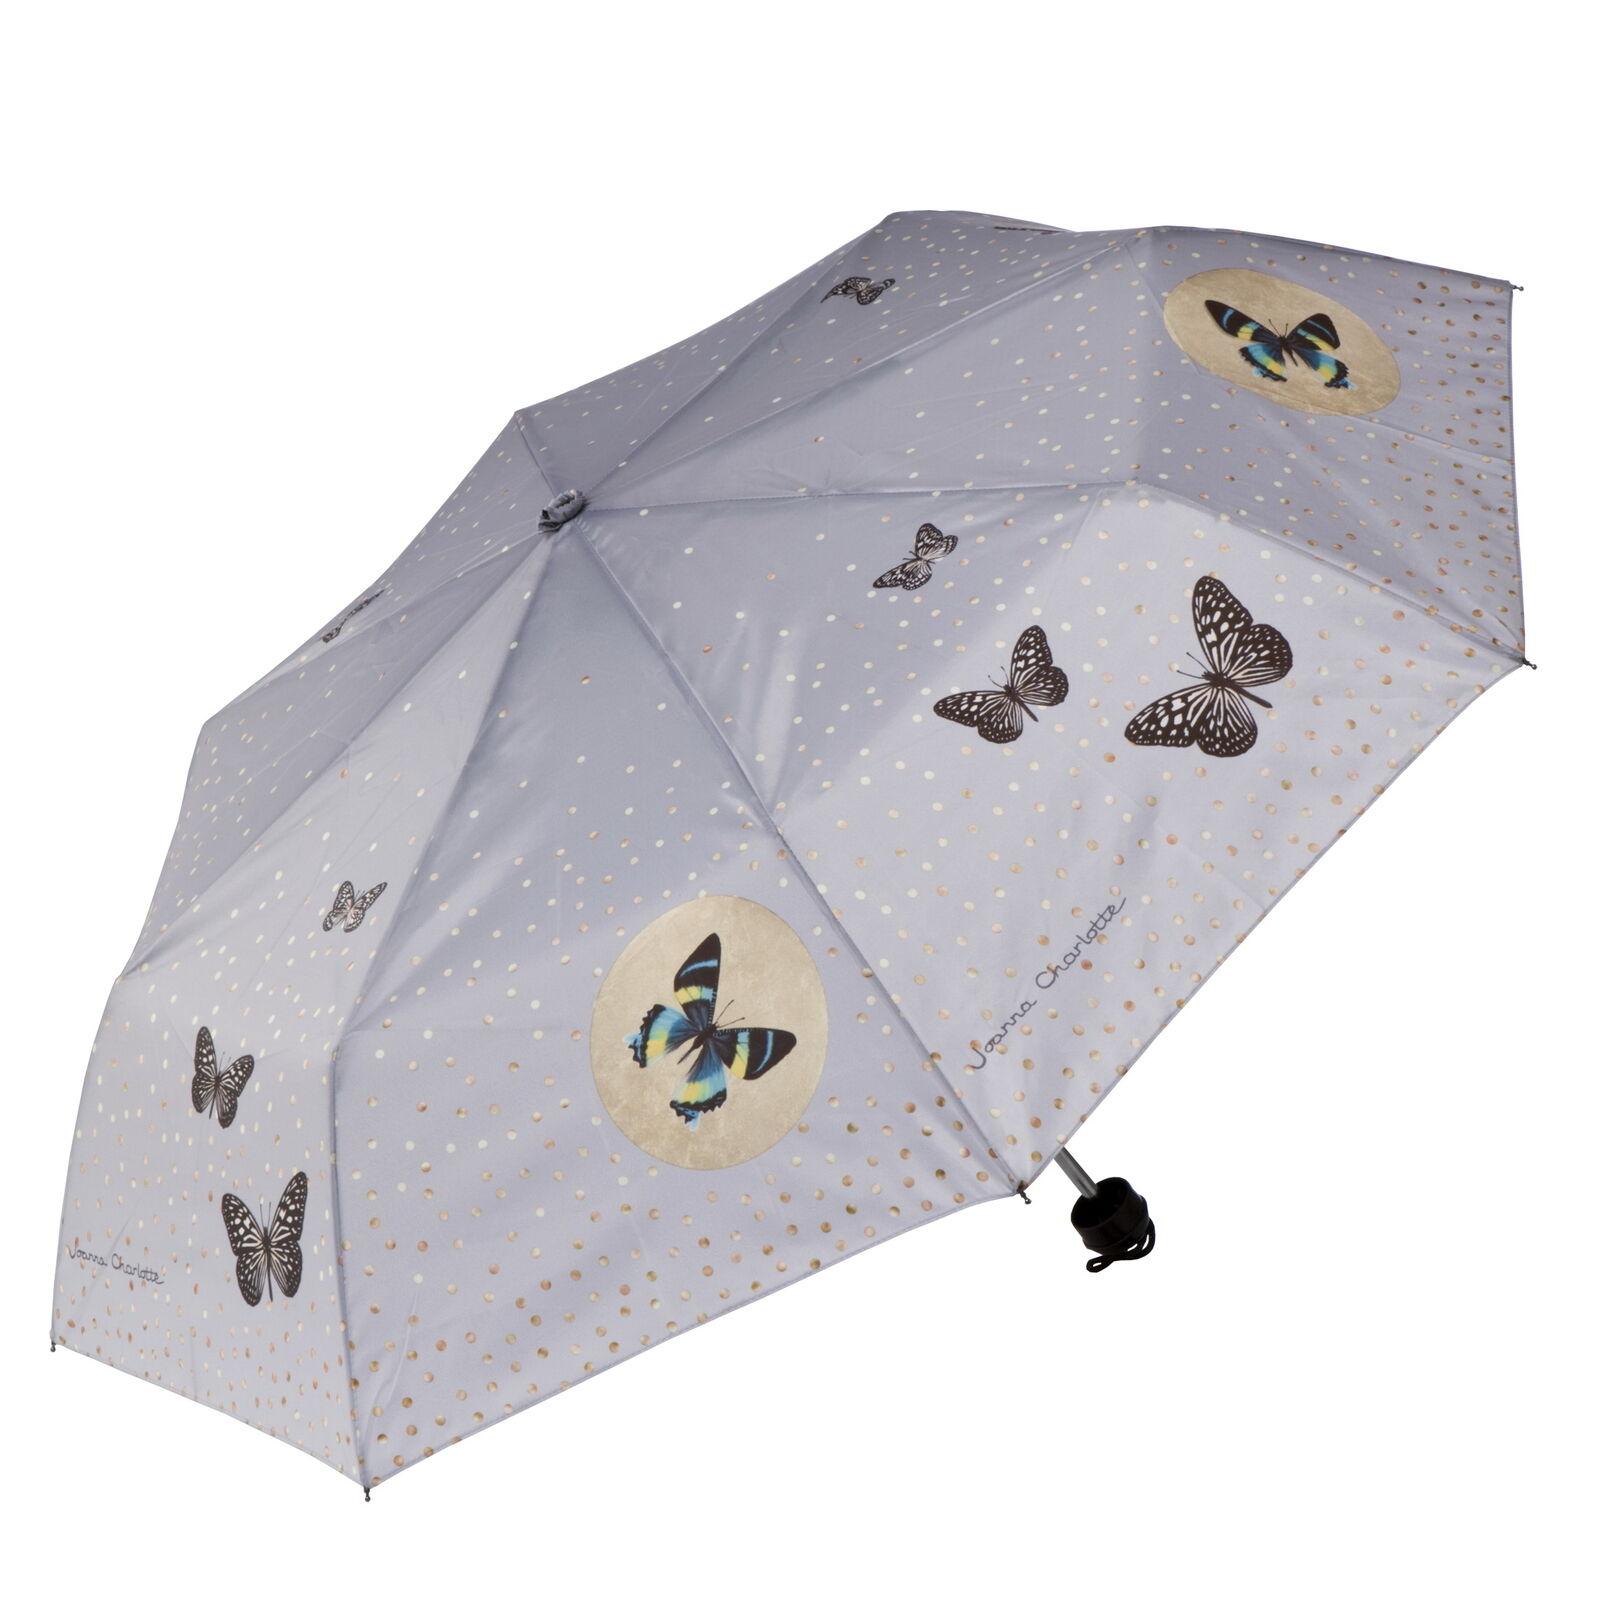 Joanna Charlotte Design - Pocket Umbrella